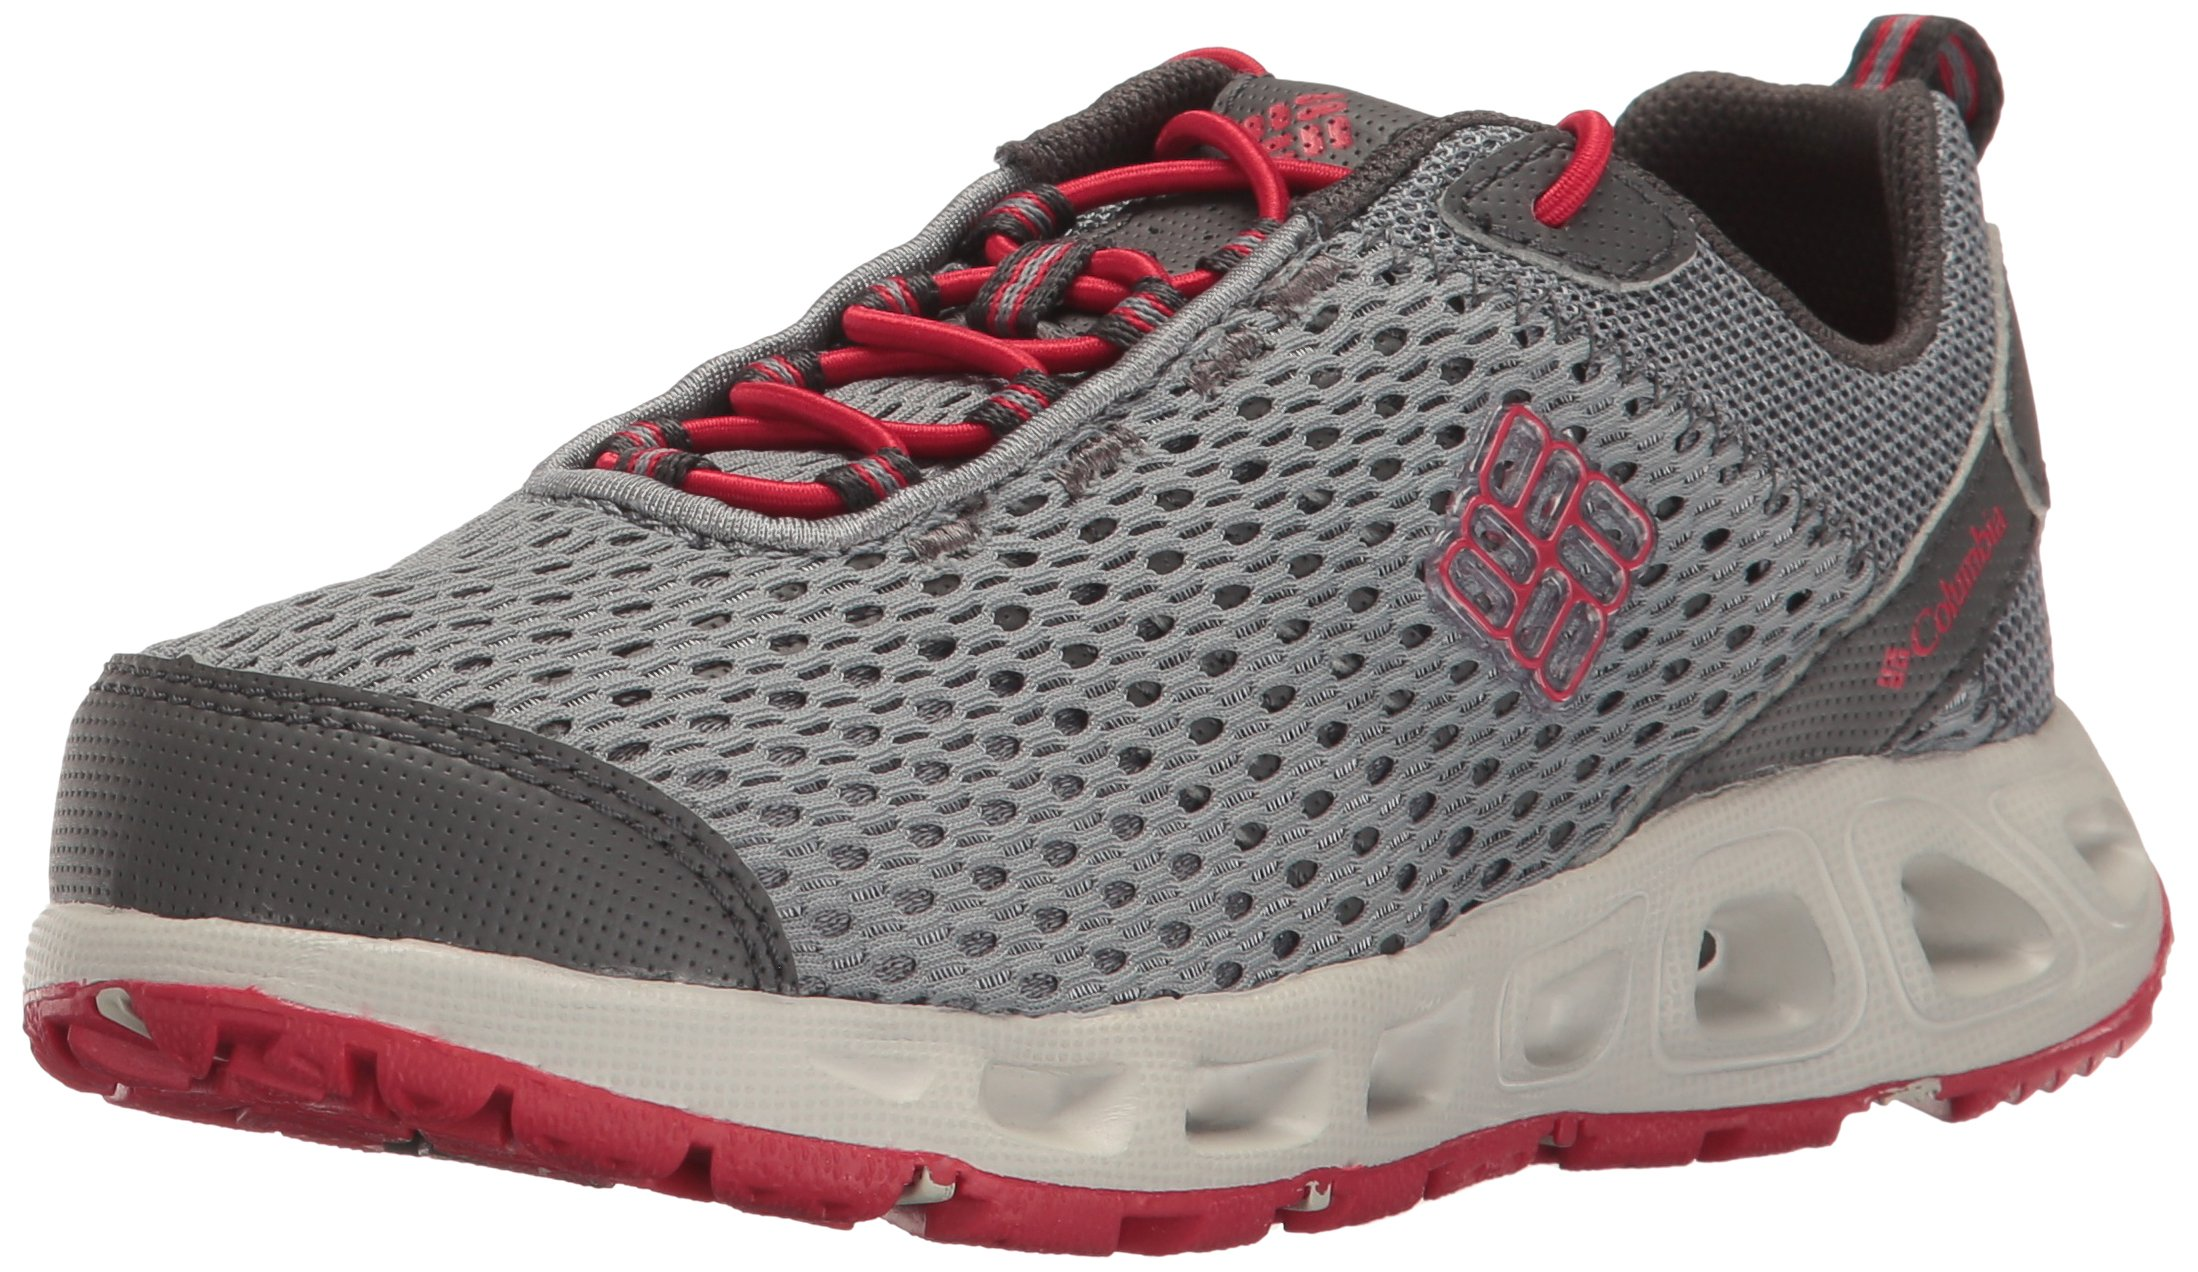 Columbia Unisex Youth Drainmaker III Water Shoe, Grey ash, Mountain red, 5 Regular US Big Kid